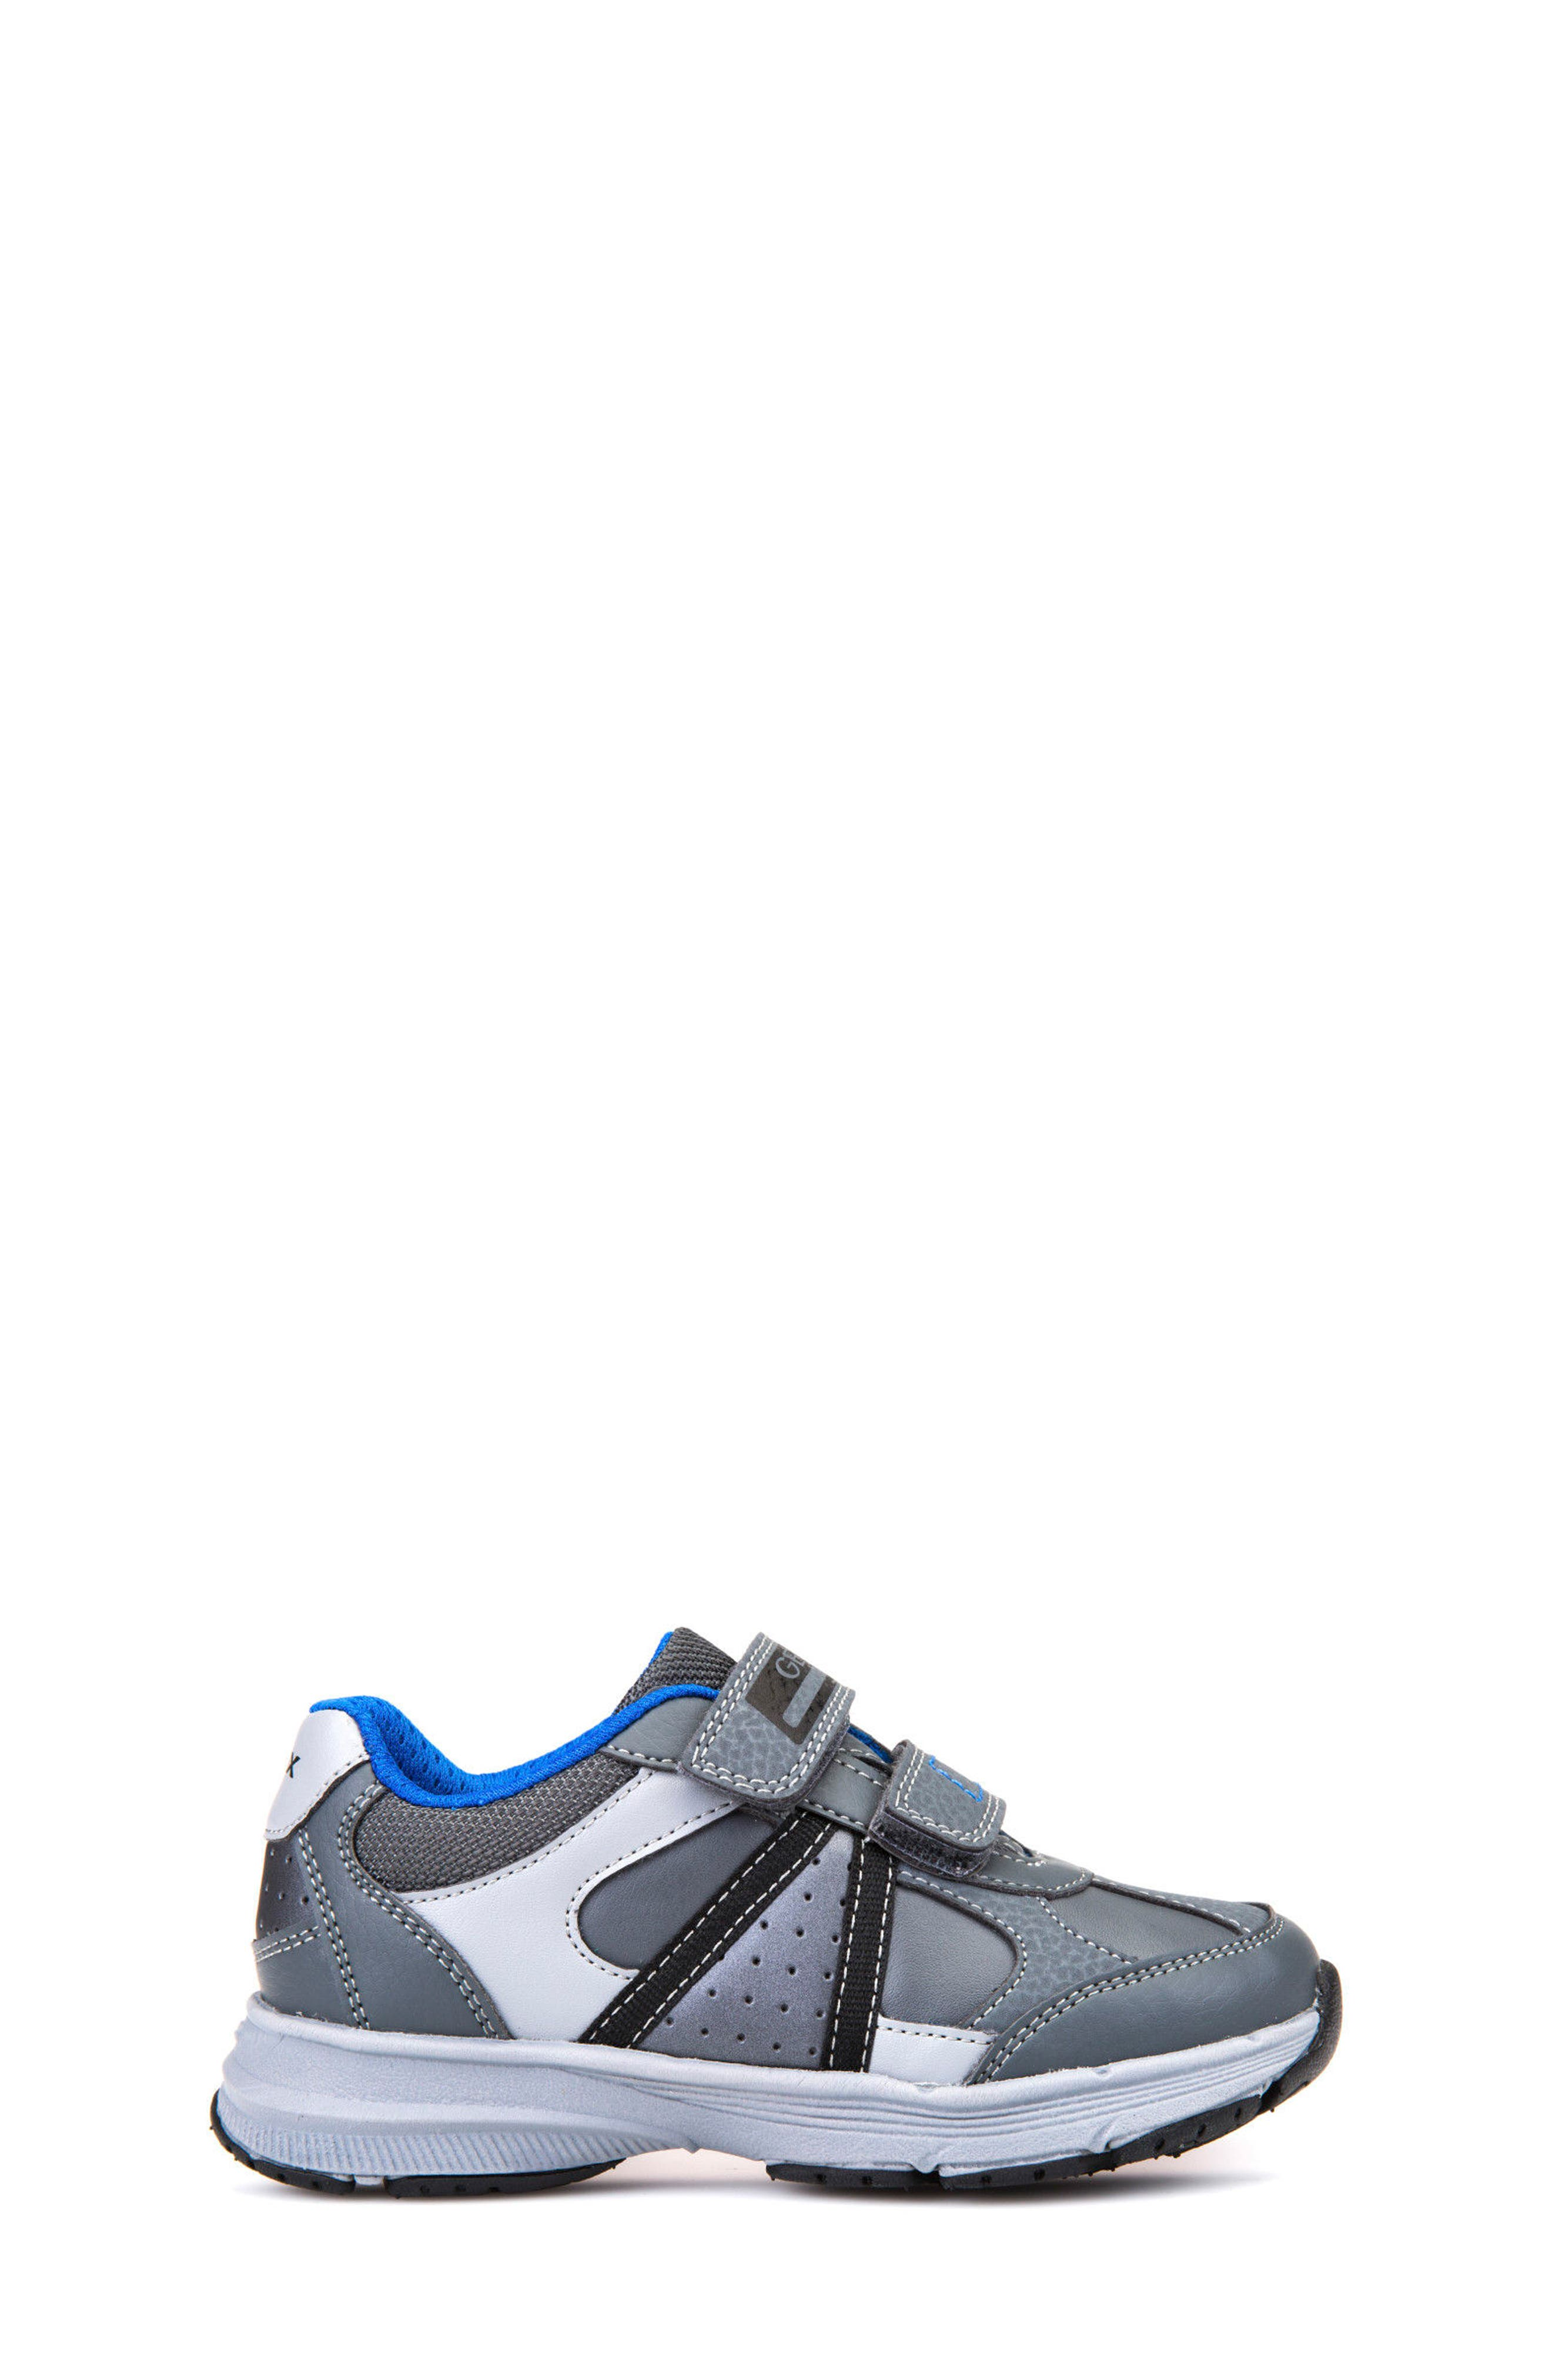 Top Fly Sneaker,                             Alternate thumbnail 3, color,                             020